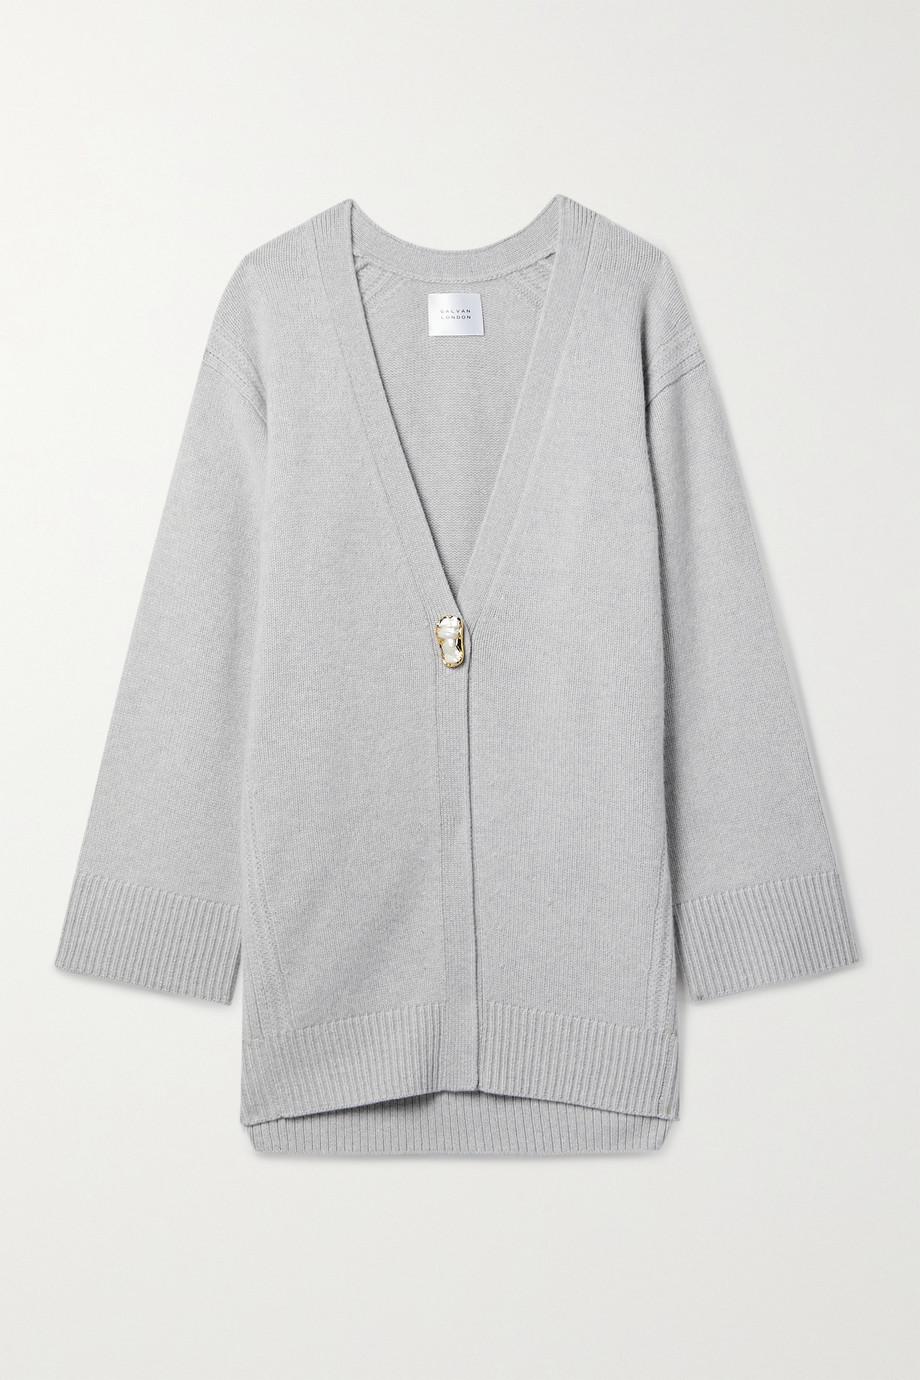 Galvan Merino wool and cashmere-blend cardigan